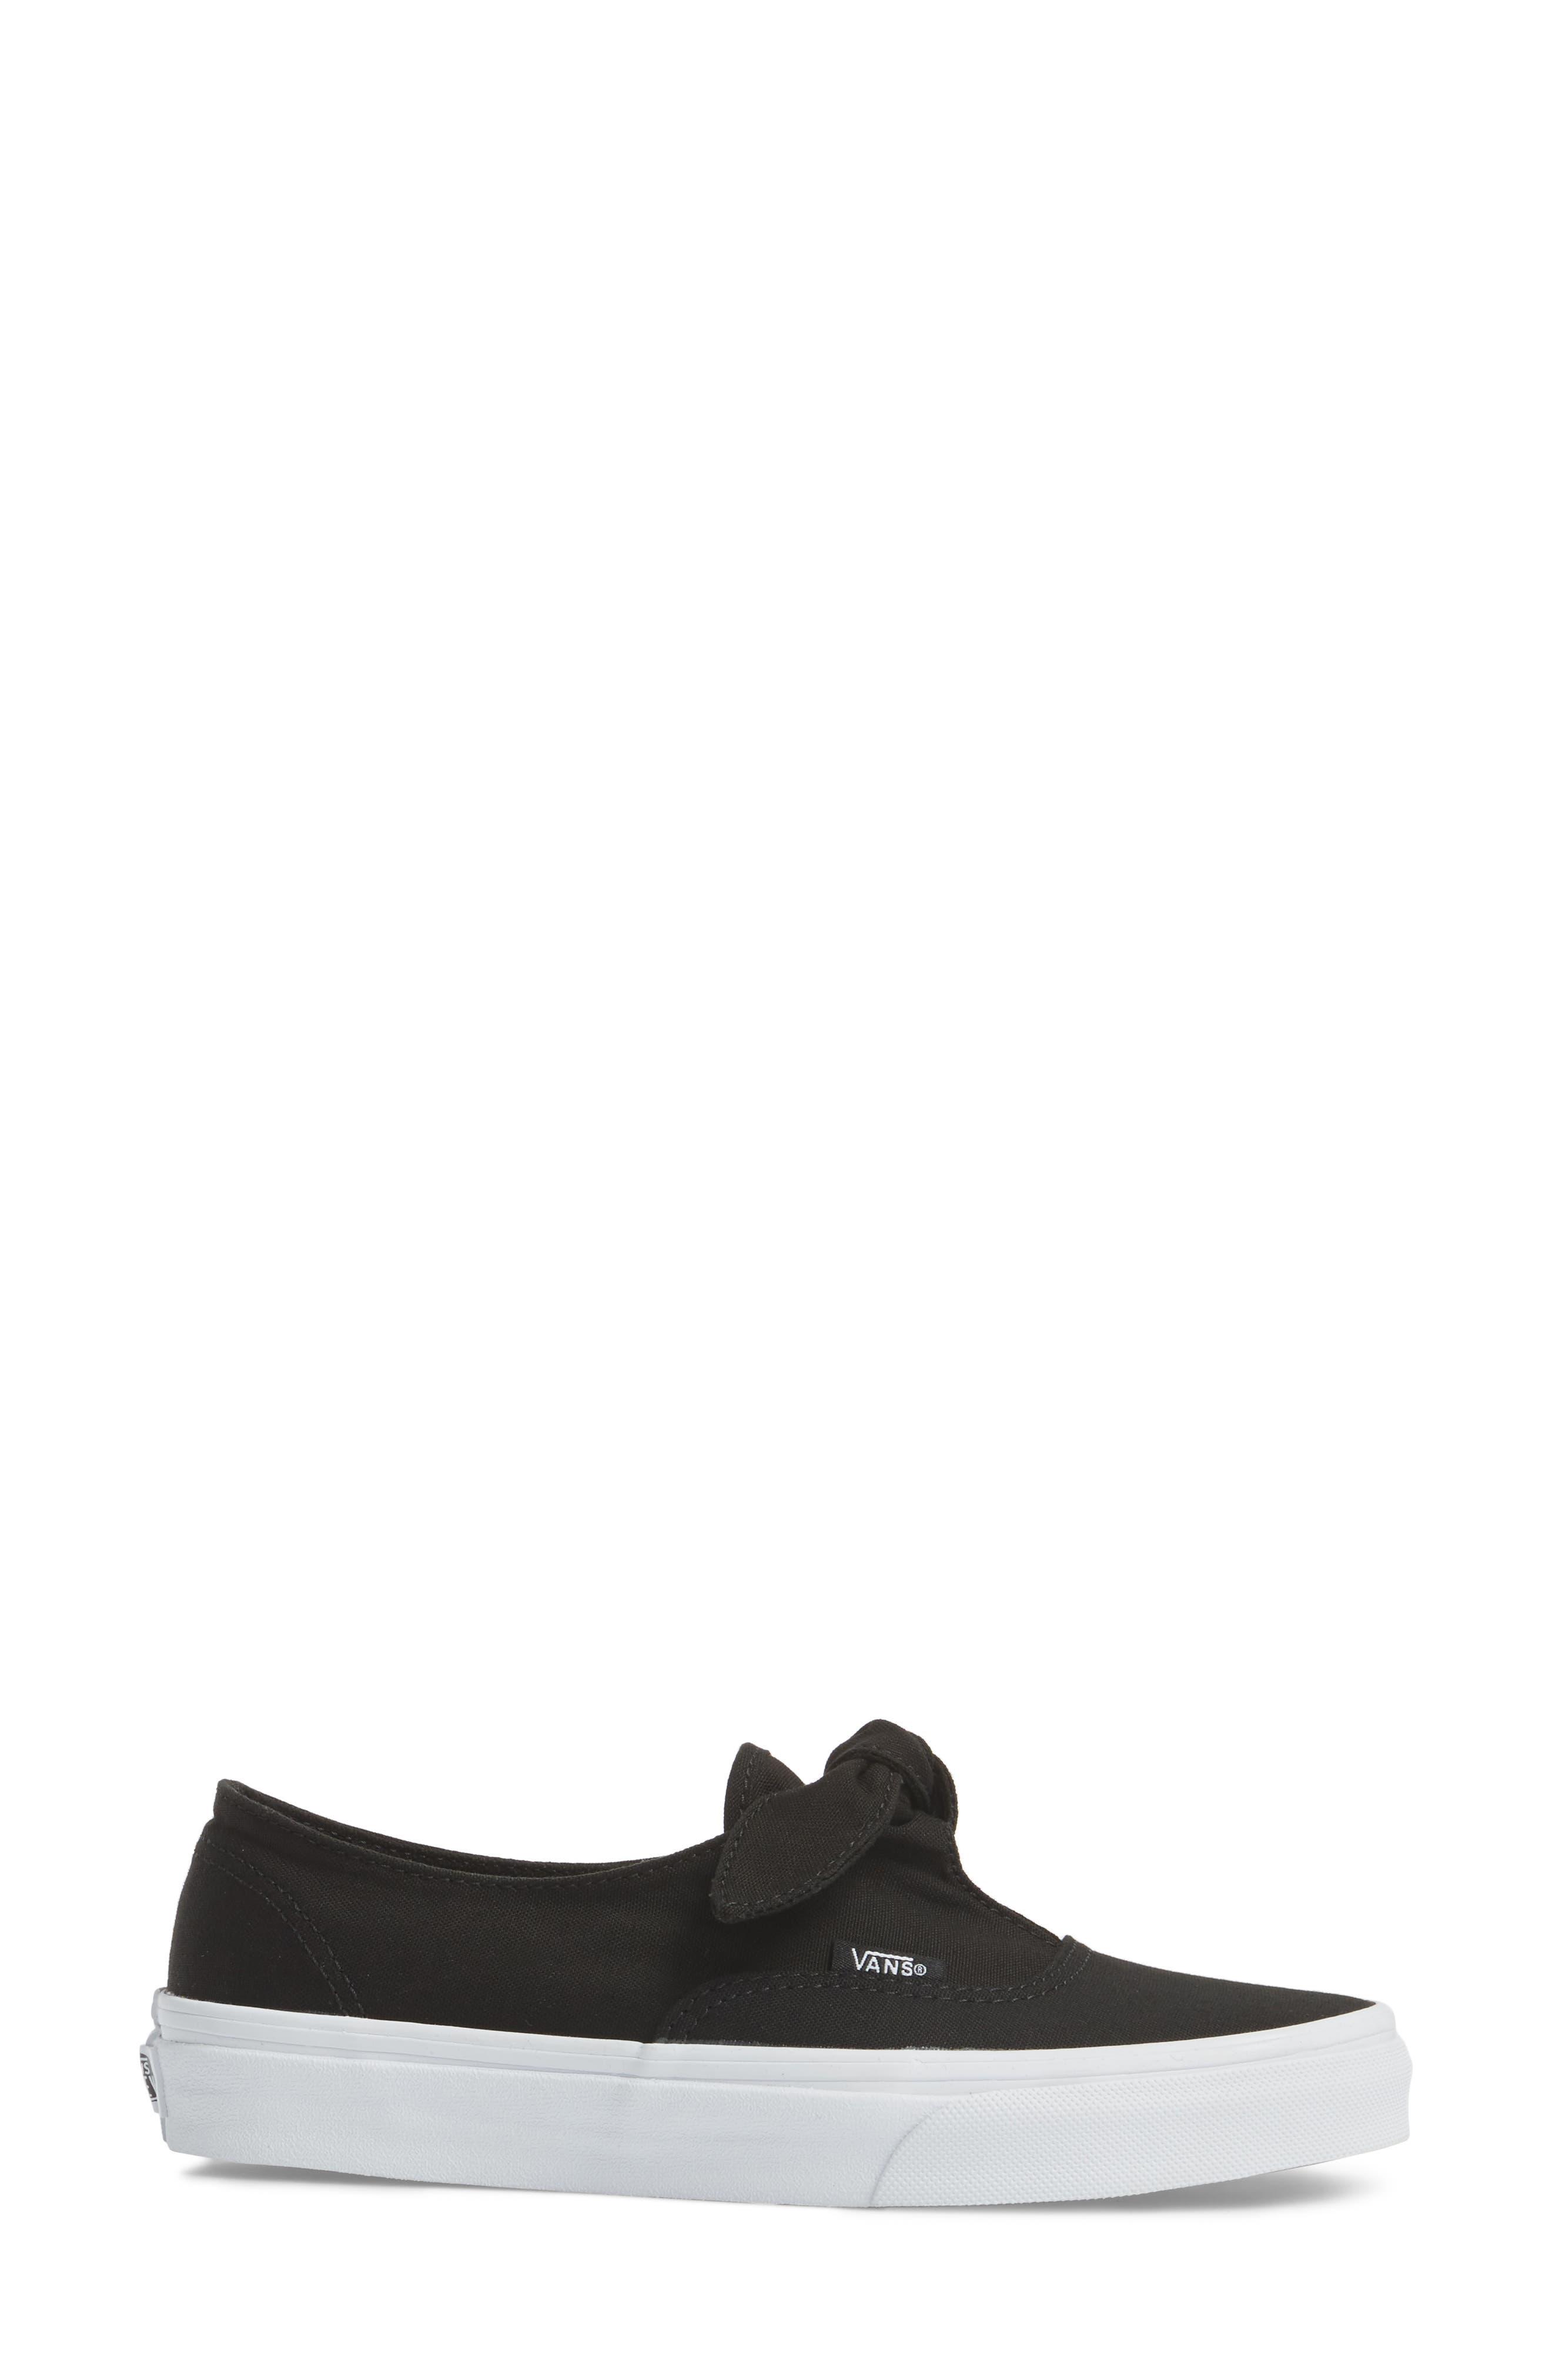 Alternate Image 3  - Vans UA Authentic Knotted Slip-On Sneaker (Women)